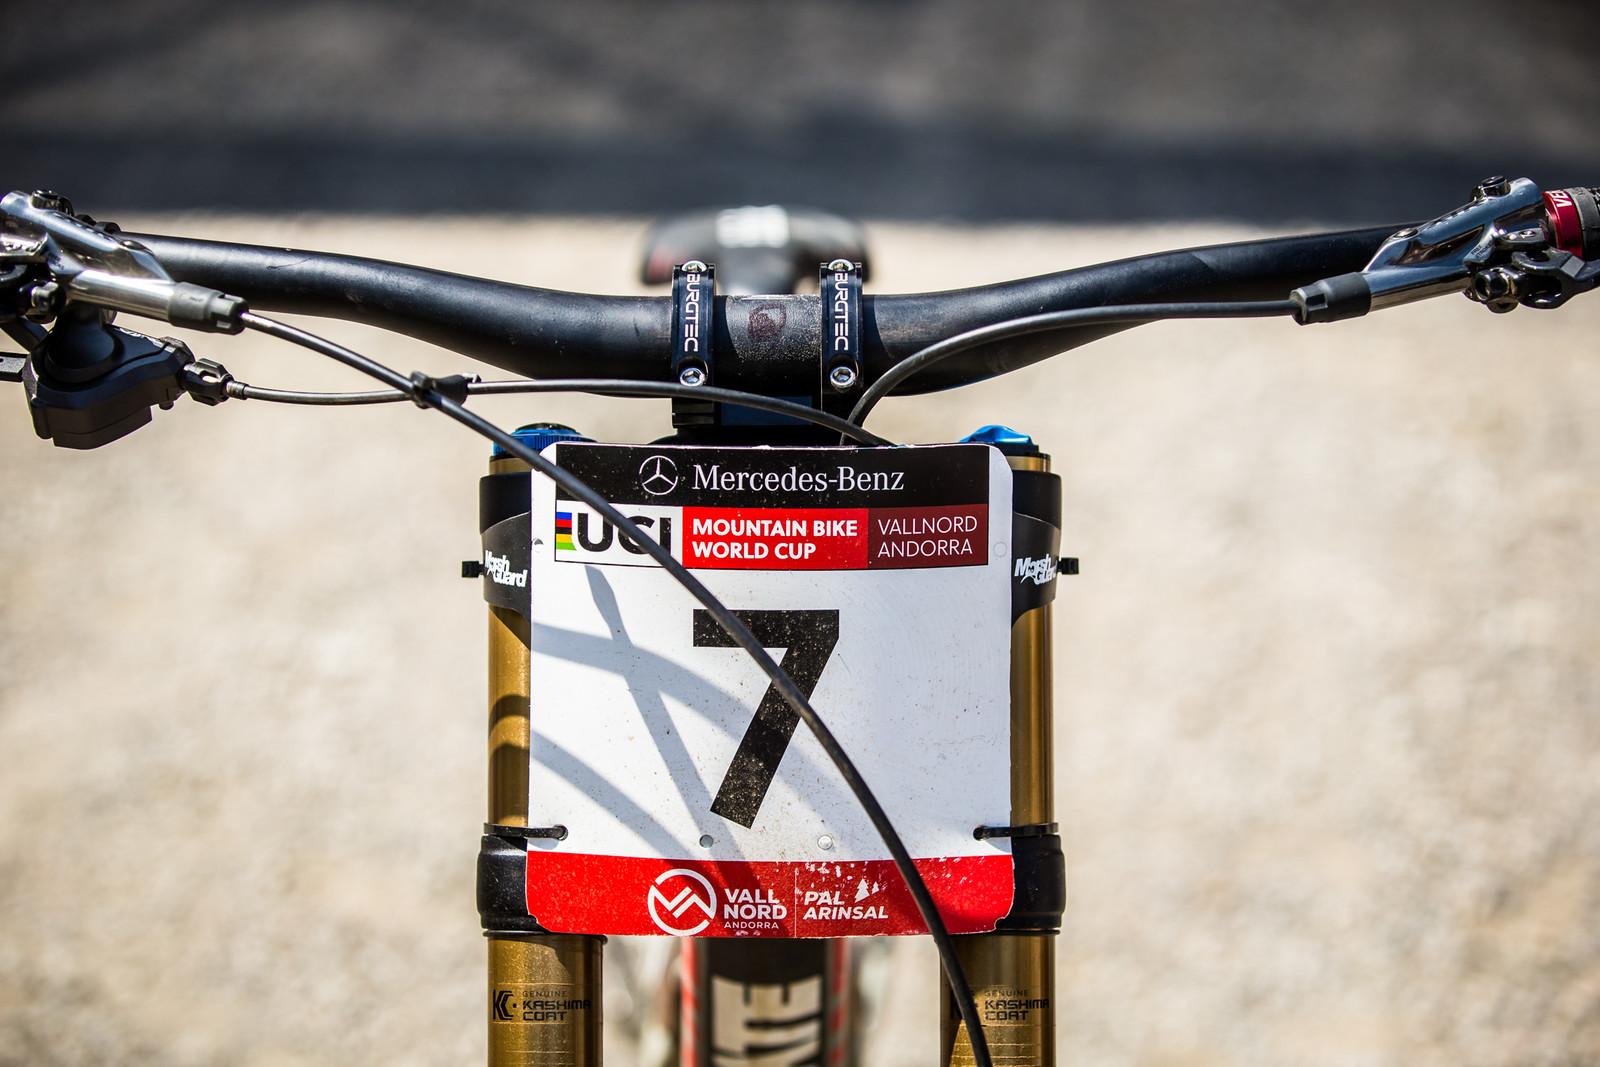 Burgtec Cockpit (Sort of) - WINNING BIKE - Loris Vergier's Santa Cruz V10cc 29 - Mountain Biking Pictures - Vital MTB